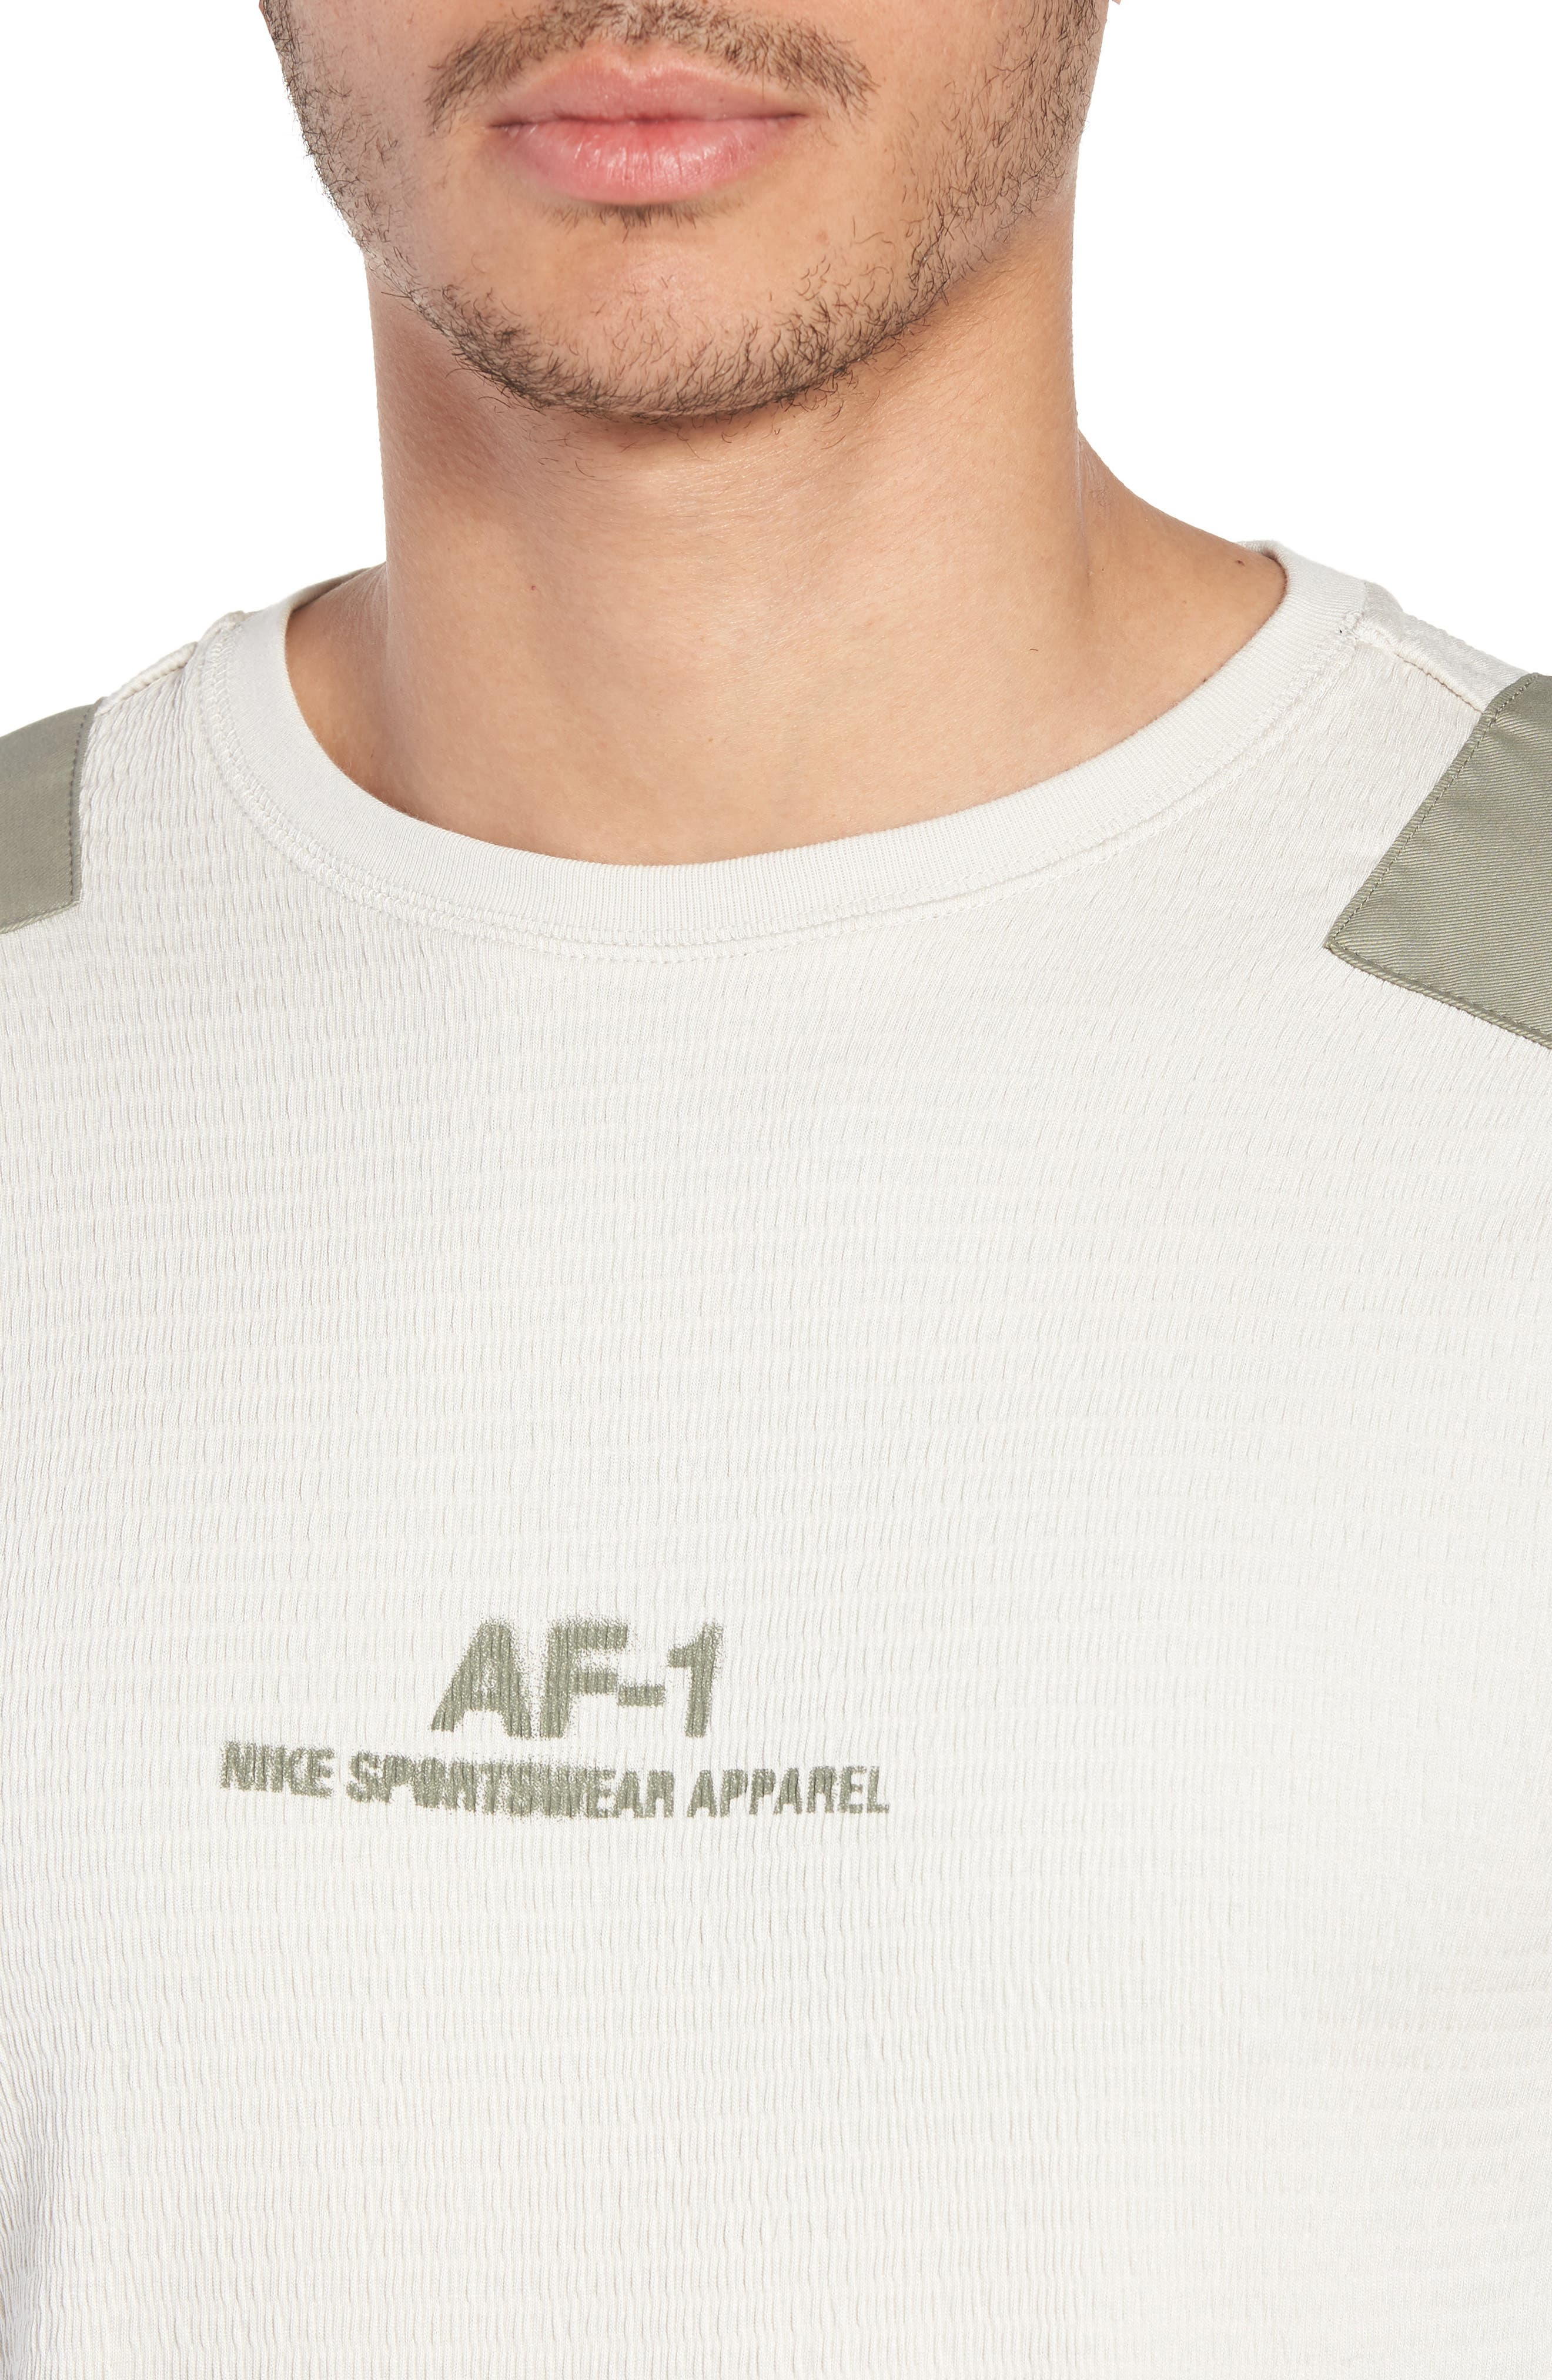 Sportswear AF-1 Long Sleeve Shirt,                             Alternate thumbnail 4, color,                             Light Bone/ Stucco/ Stucco